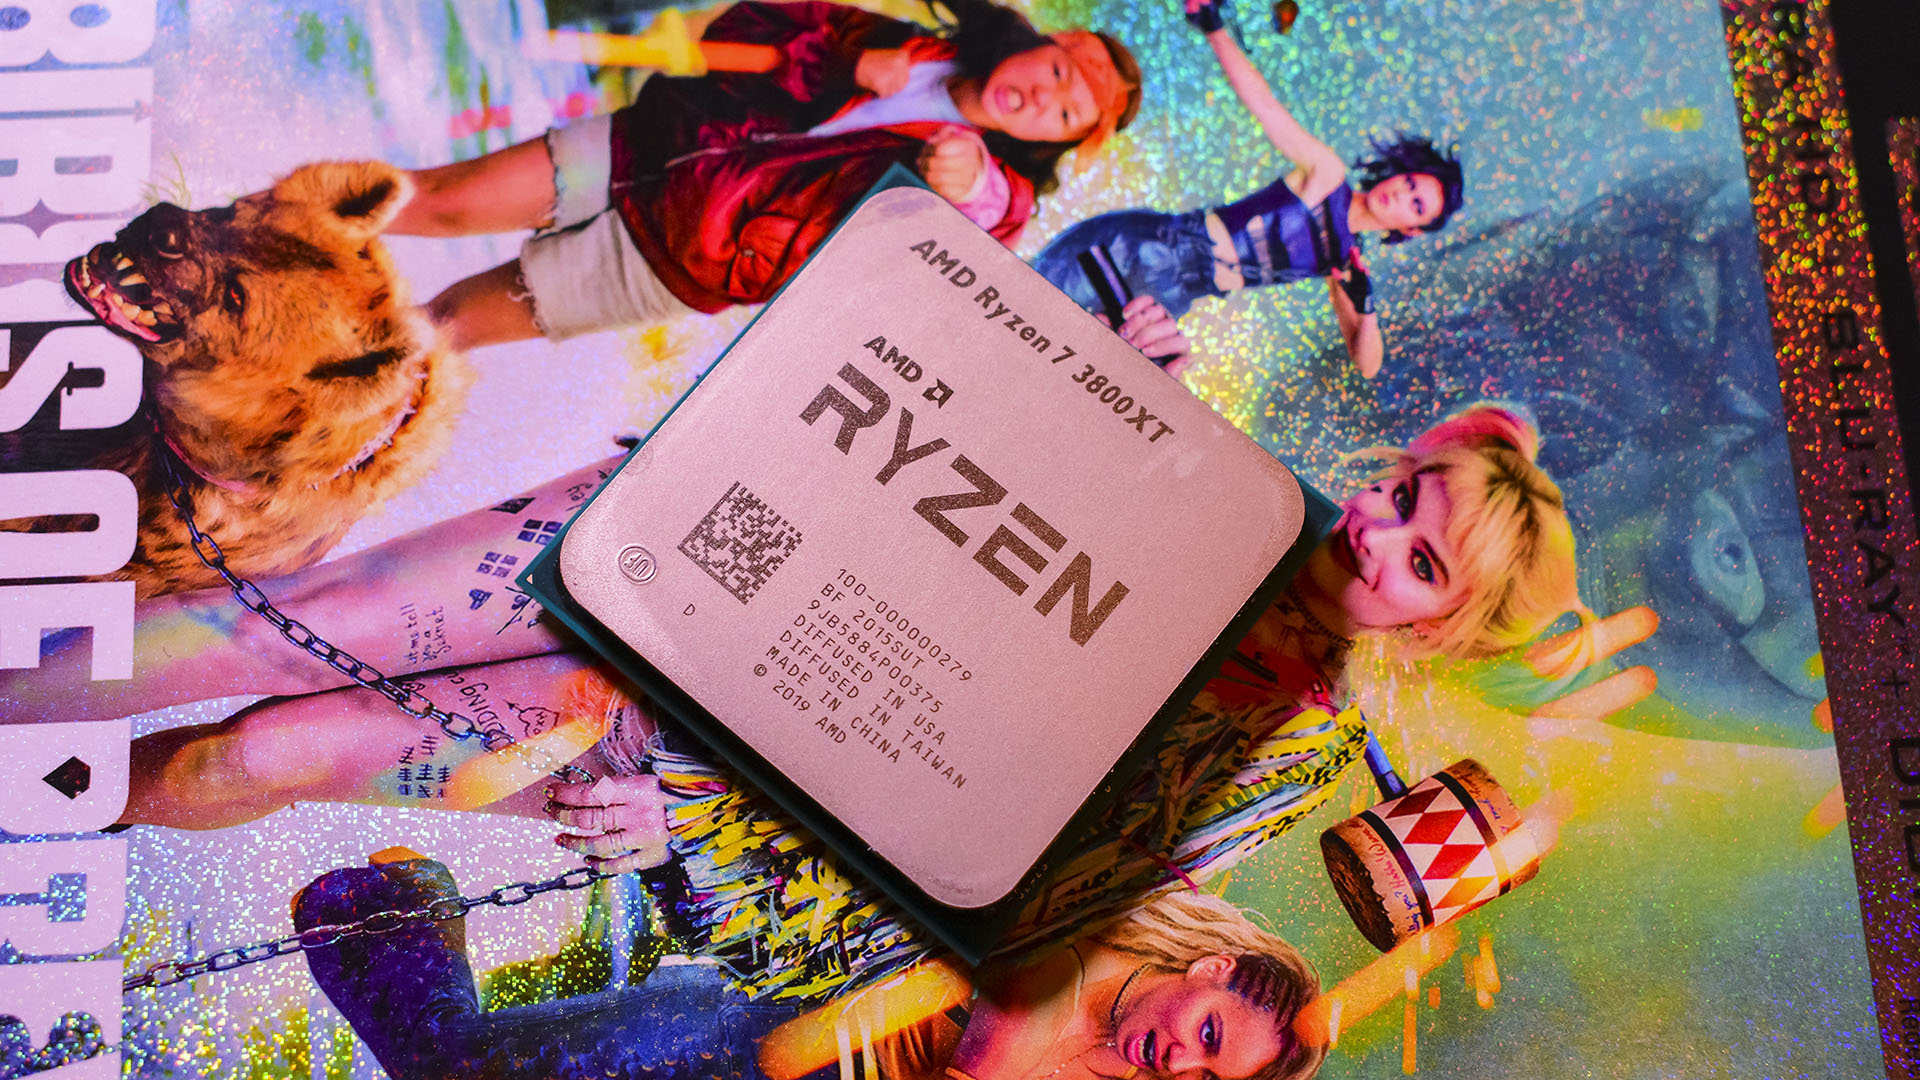 AMD Ryzen 7 5800X leak shows a powerhouse gaming CPU that could embarrass Intel's Core i9-10900K